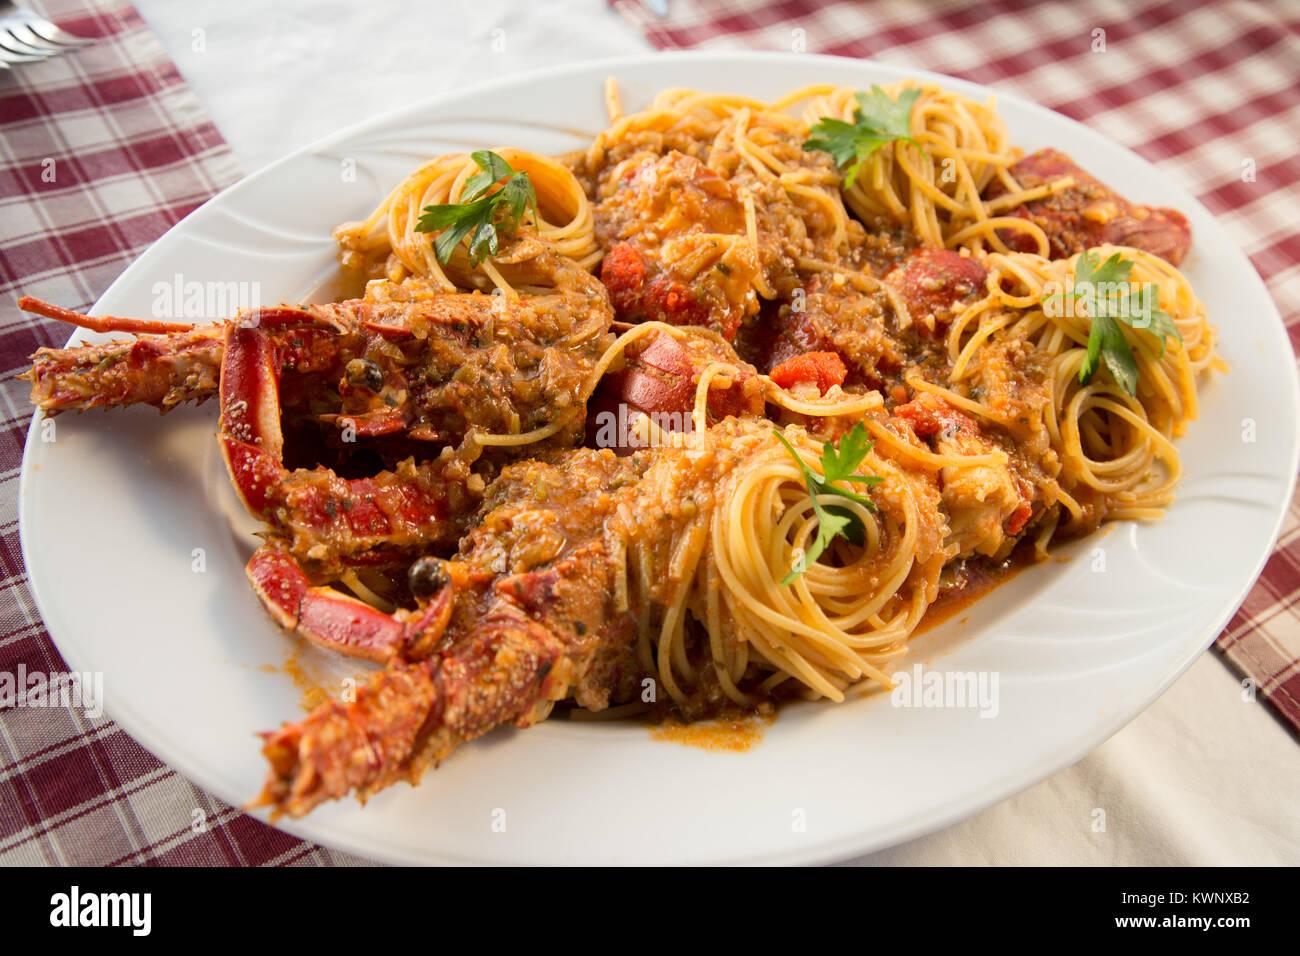 Lobster with spaghetti, Food, Croatia - Stock Image